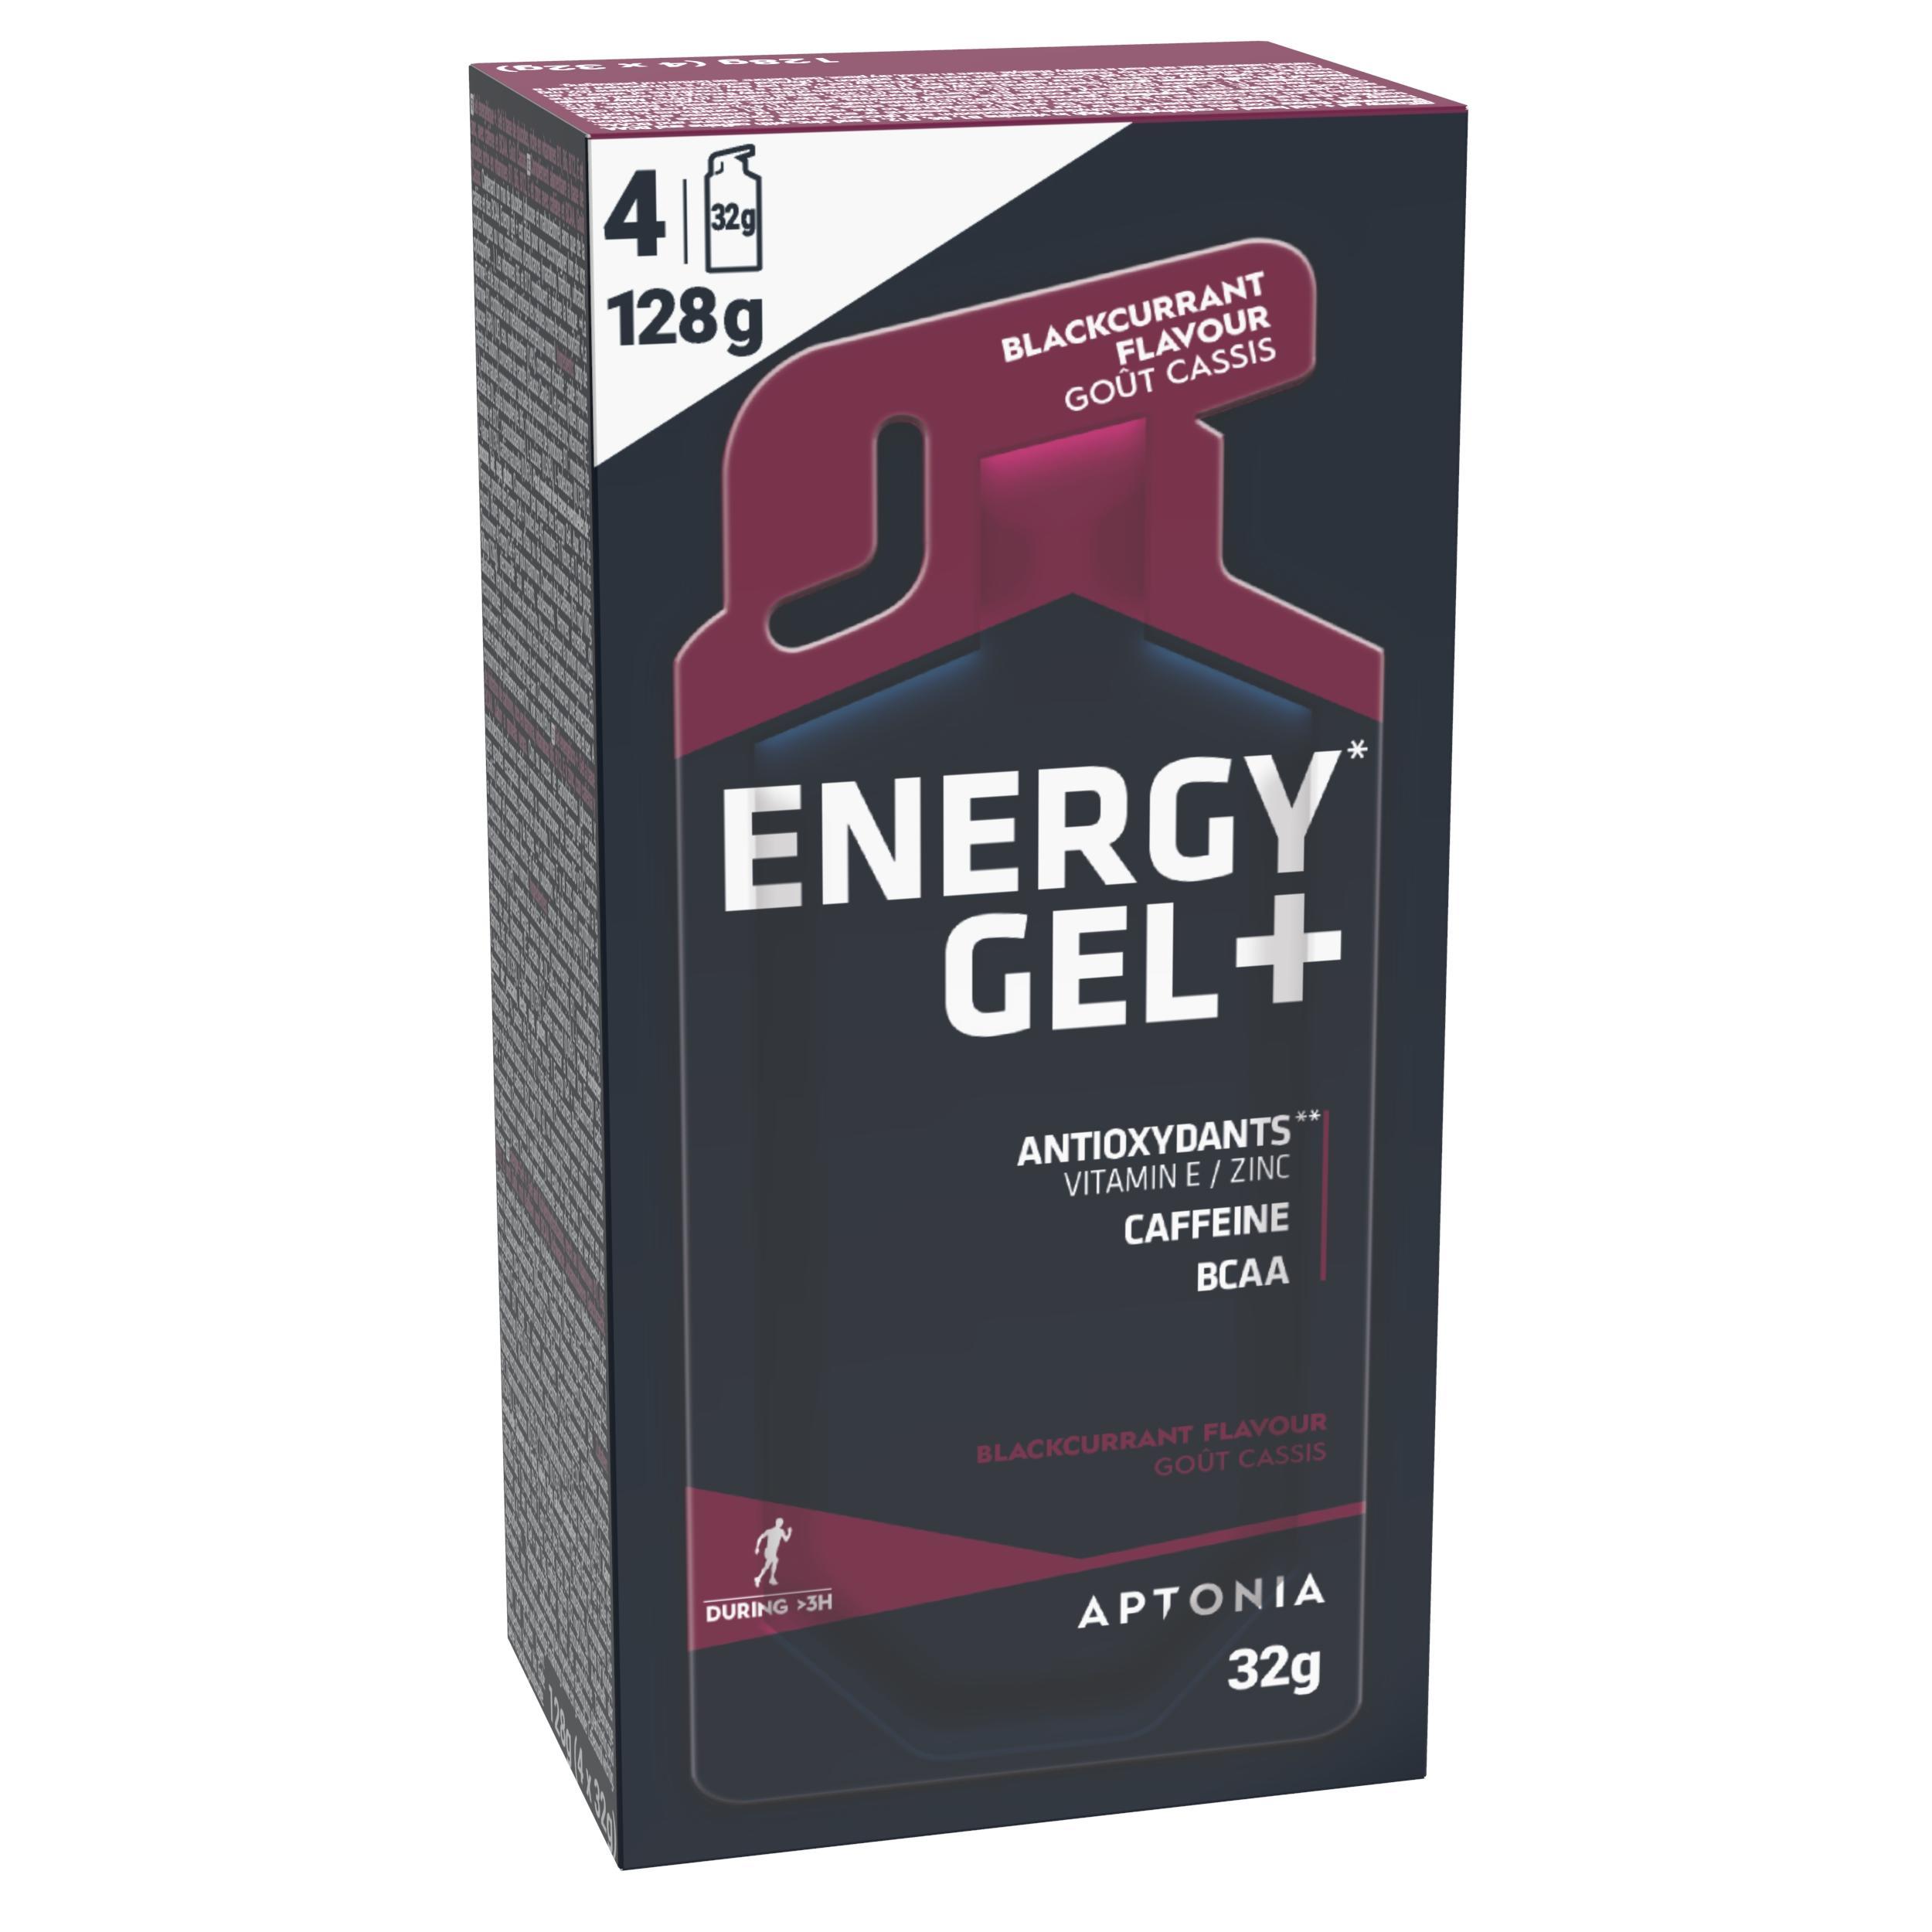 Gel Energy Gel+ Coacăze 4x32g de la APTONIA